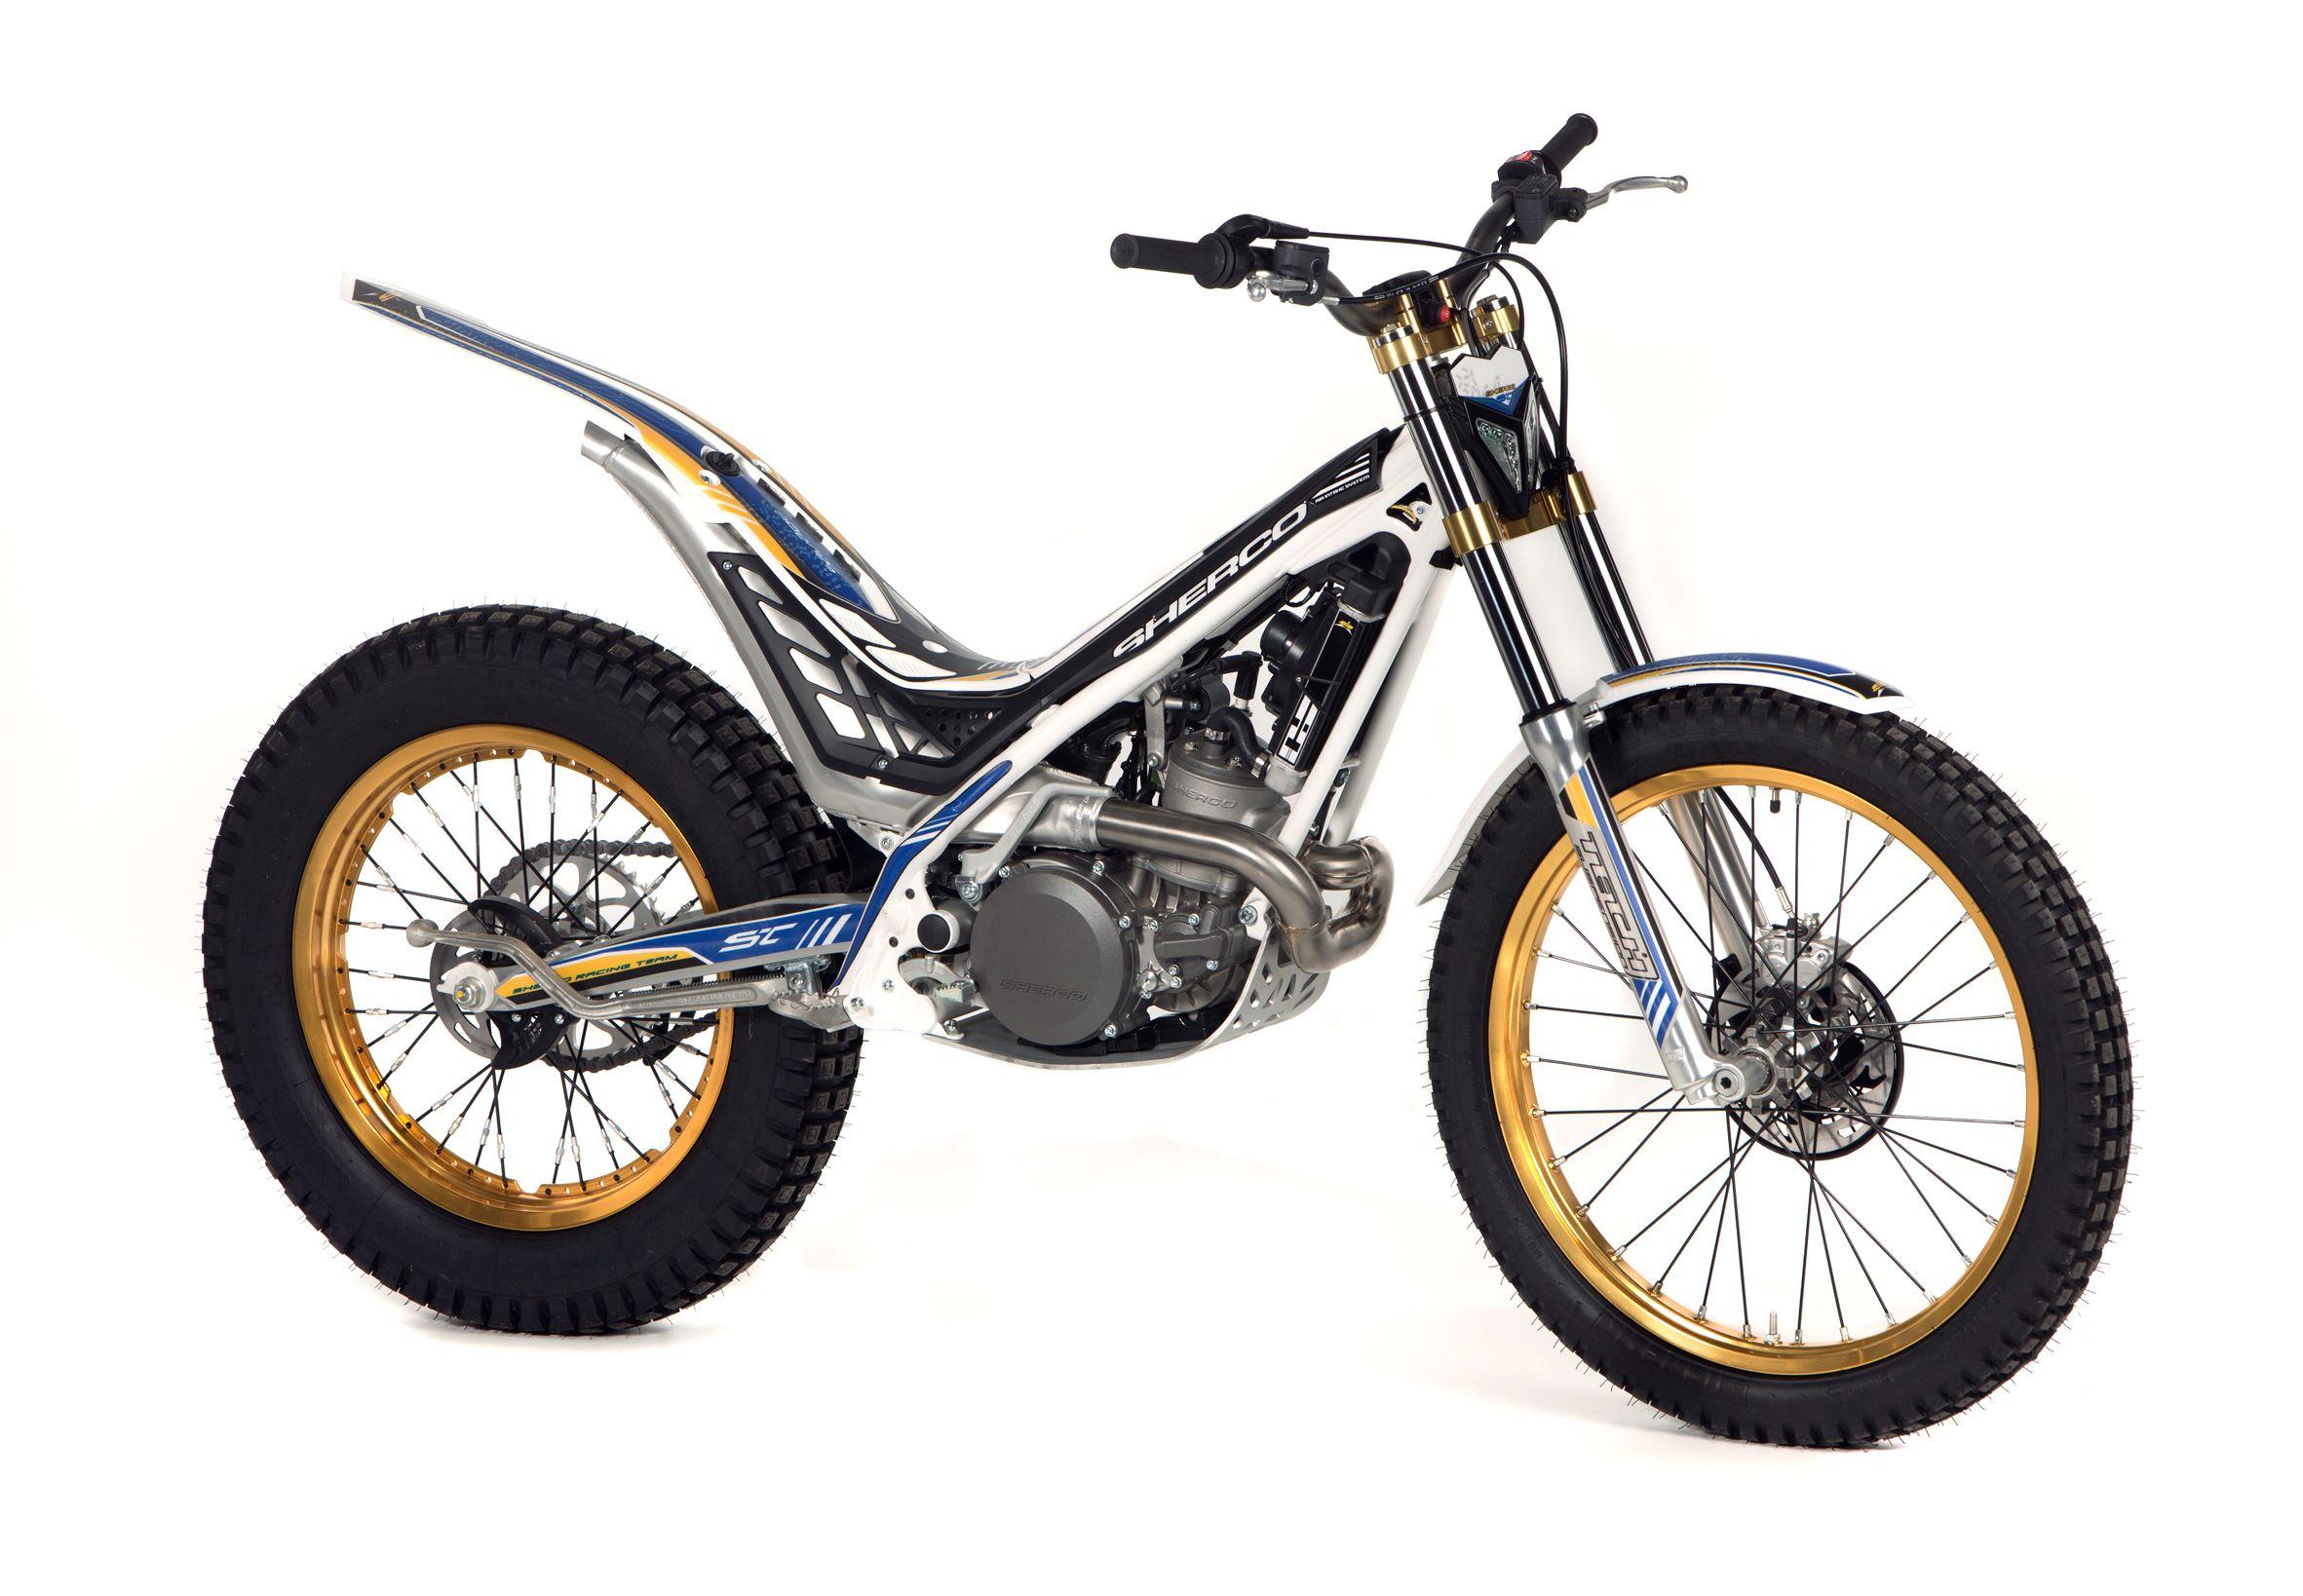 sherco st trials bike i like bikes vroom vroom kind. Black Bedroom Furniture Sets. Home Design Ideas